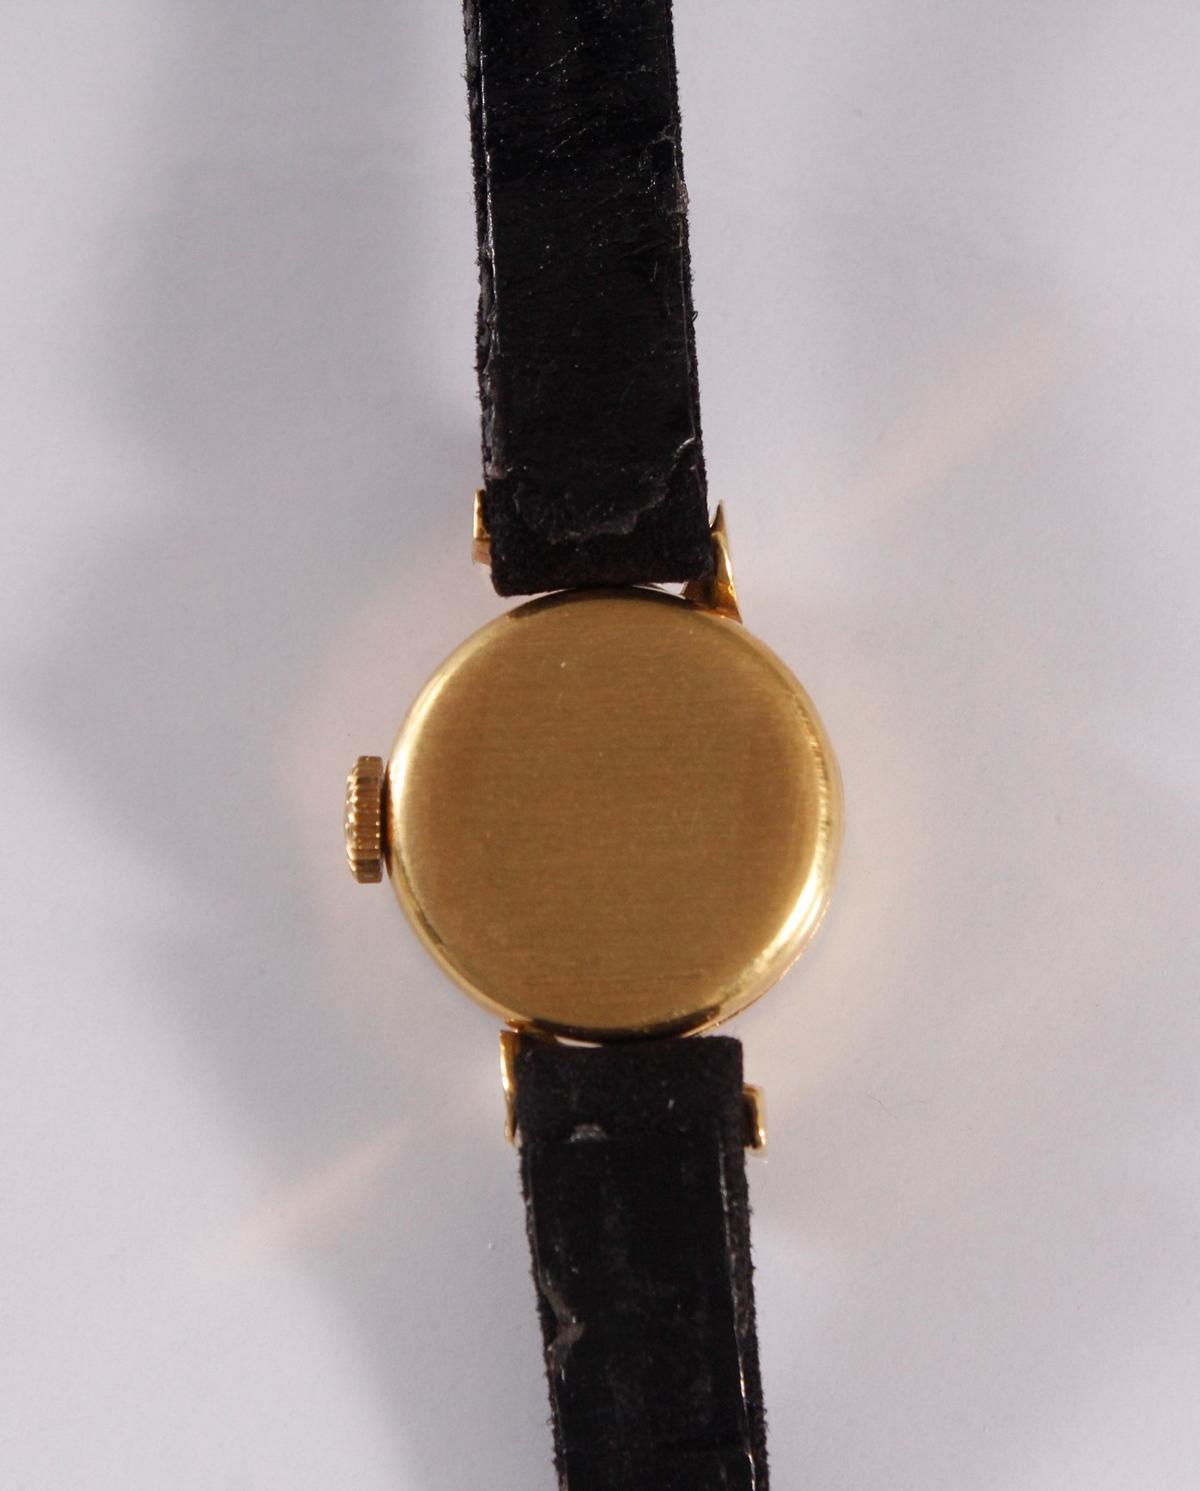 Longine Damenarmbanduhr, 18 Karat Gelbgold-5